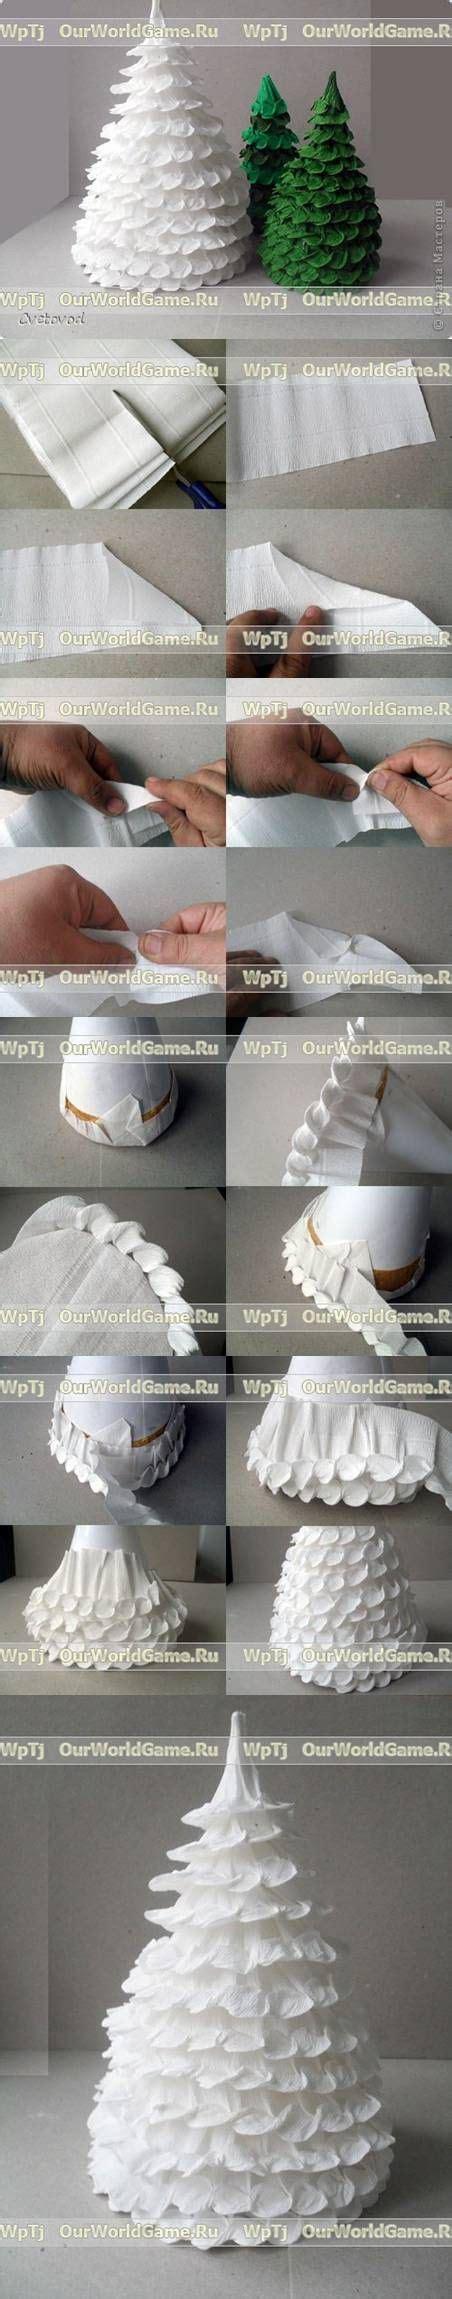 corrugated paper craft своими руками navidad and trees